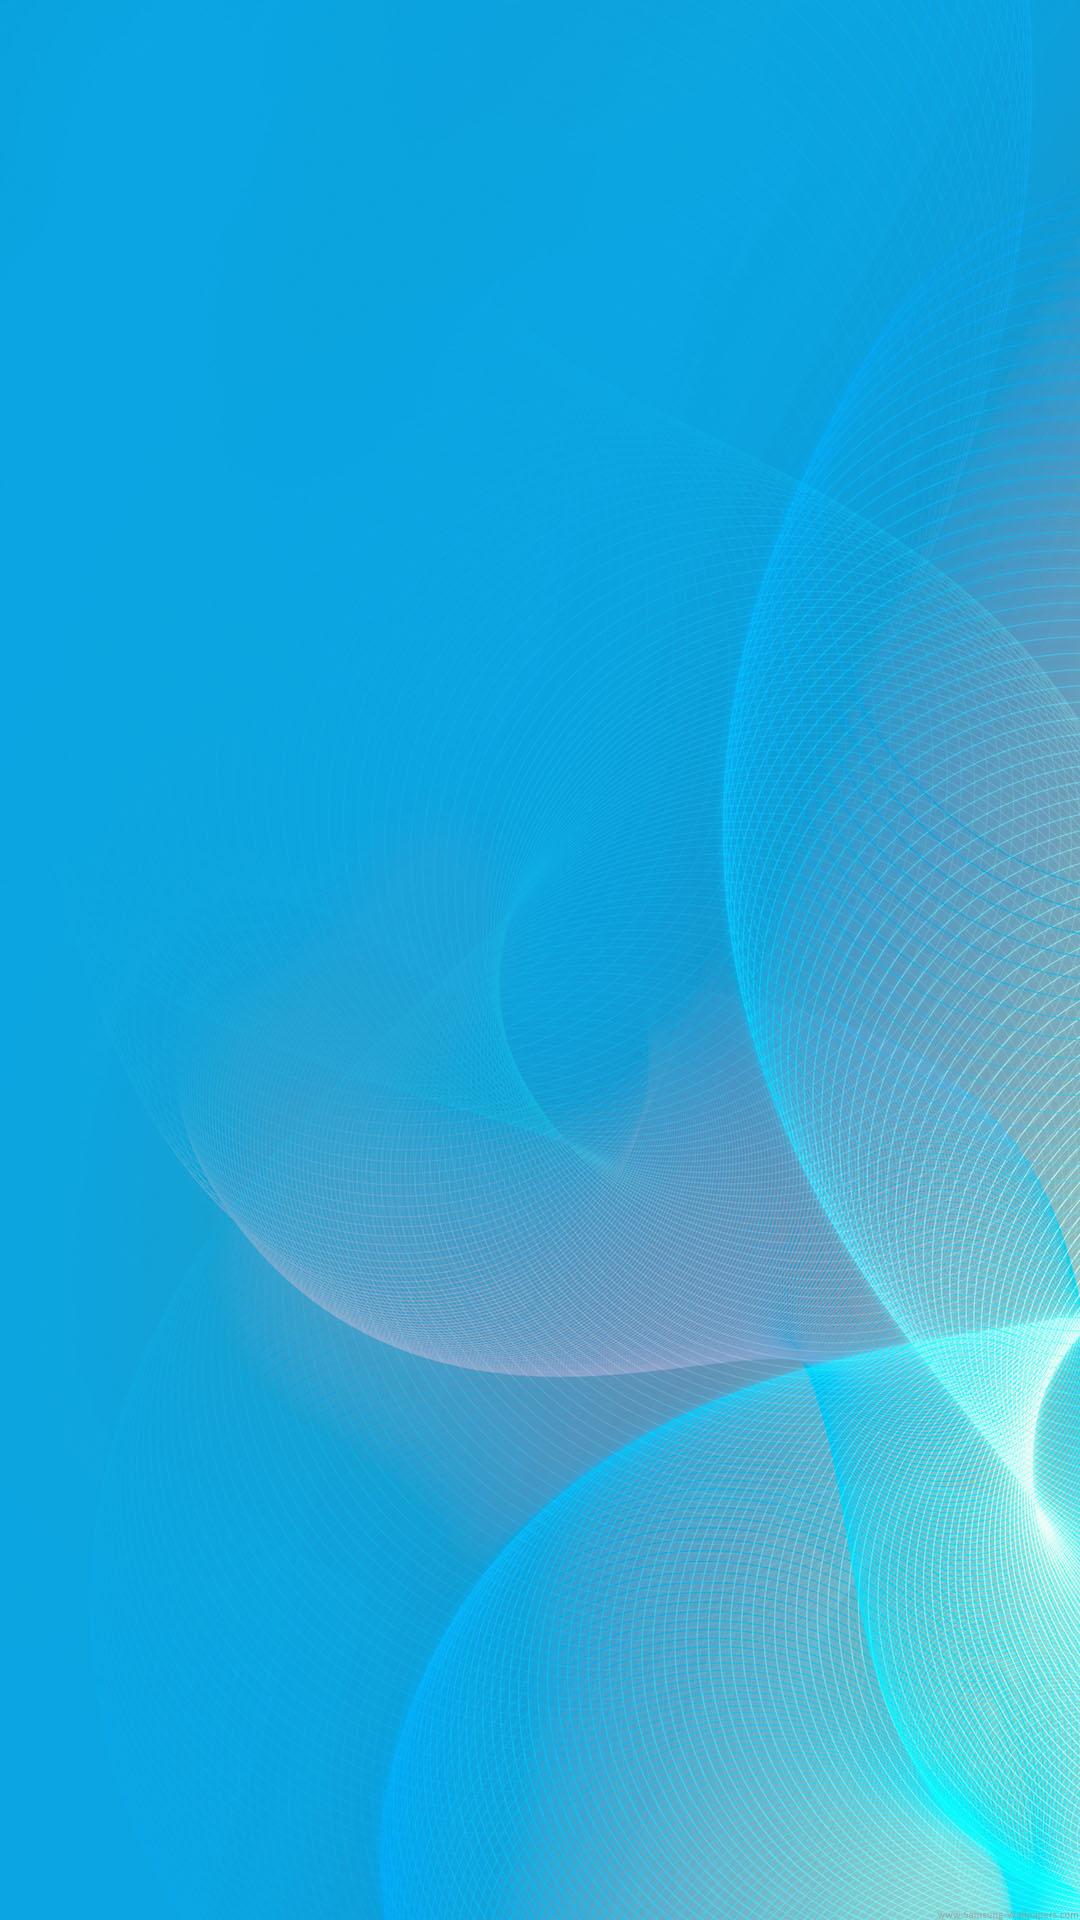 Nexus 7 Wallpaper Downloads Wallpapersafari